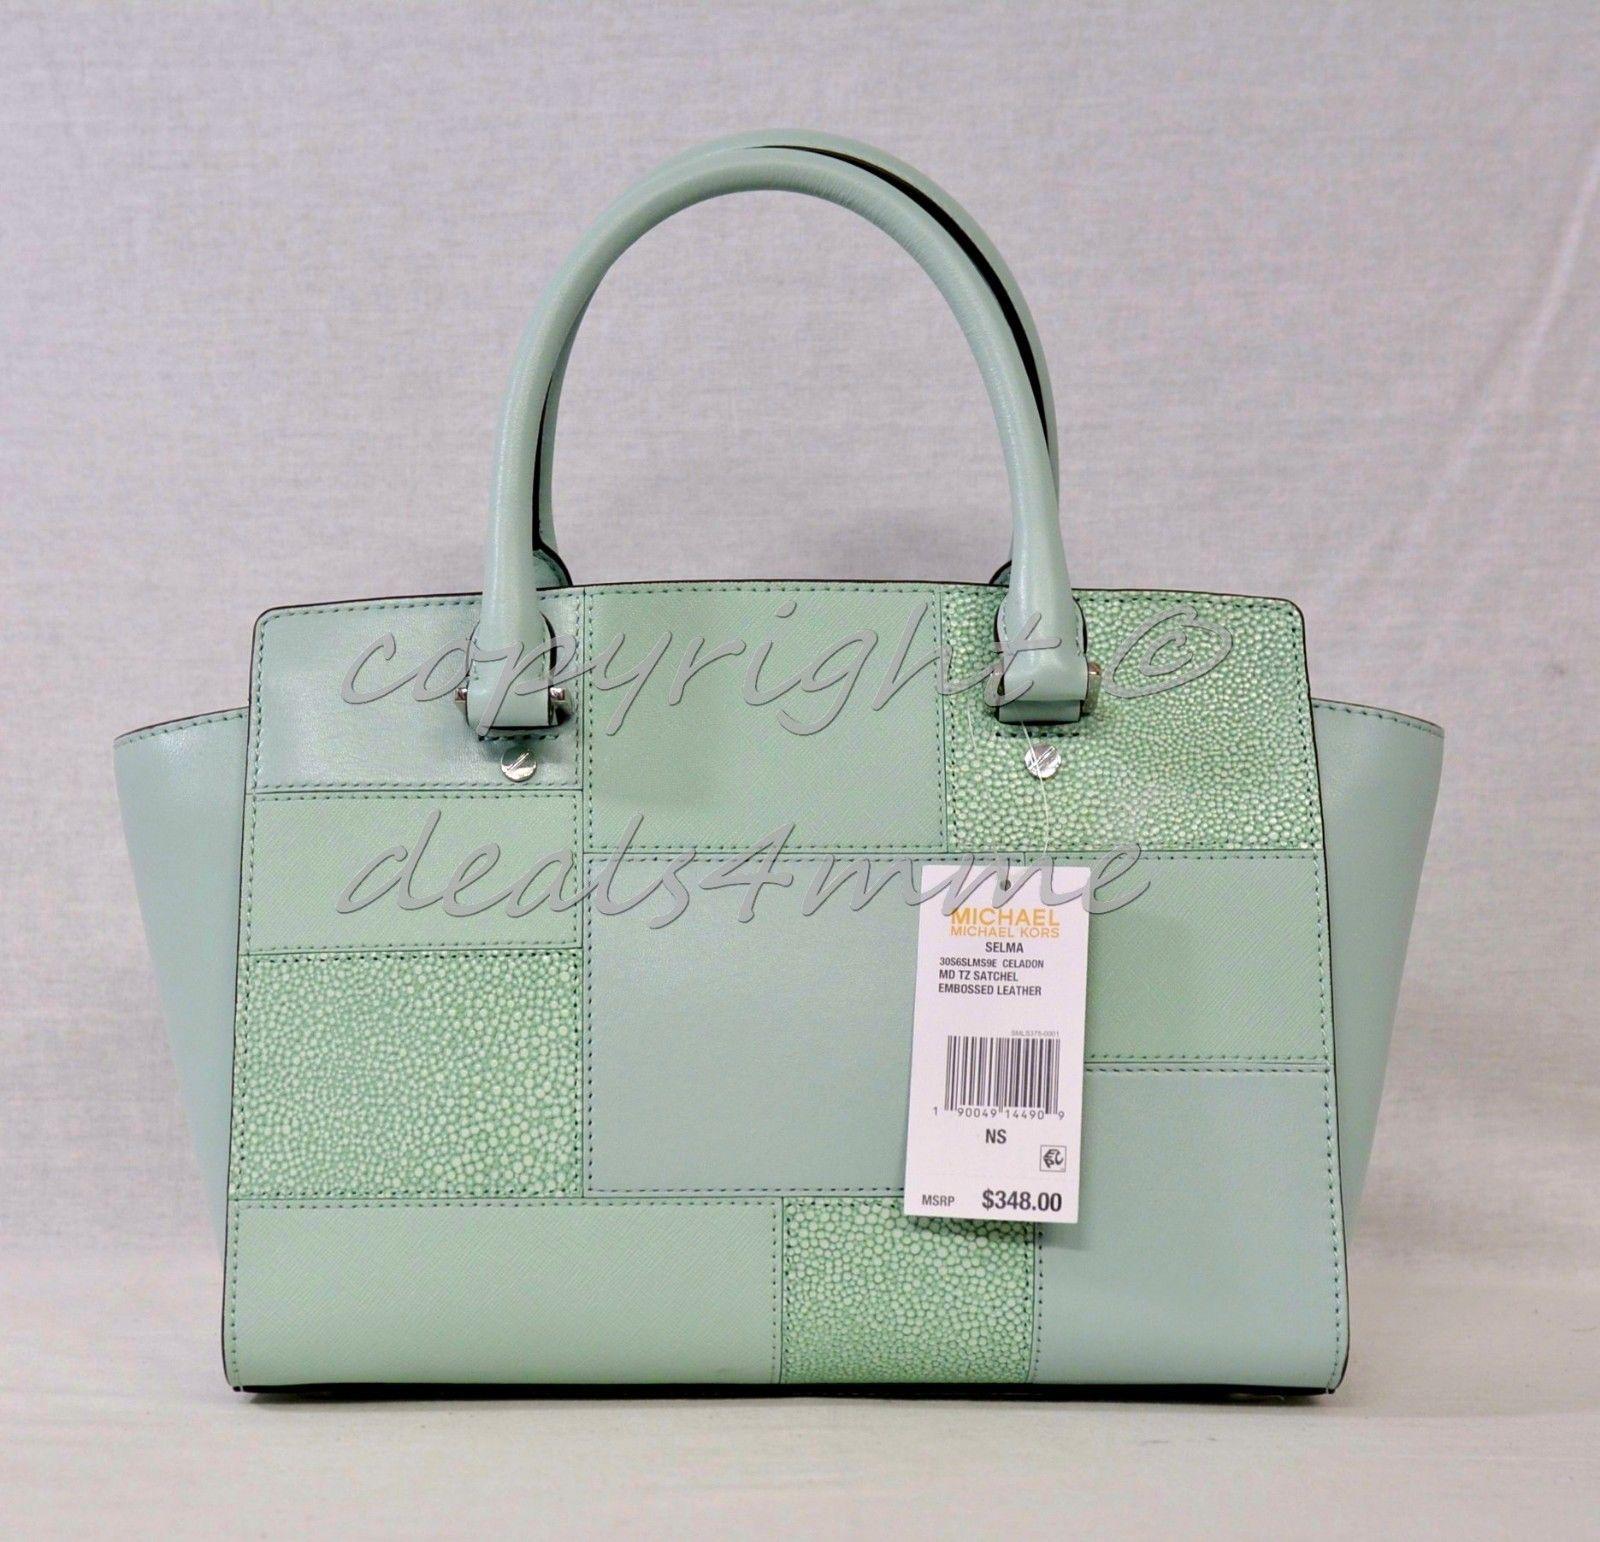 7dad2b1df397 Michael Kors Selma Medium Top Zip Satchel Shoulder Bag in Celadon - Light  Green